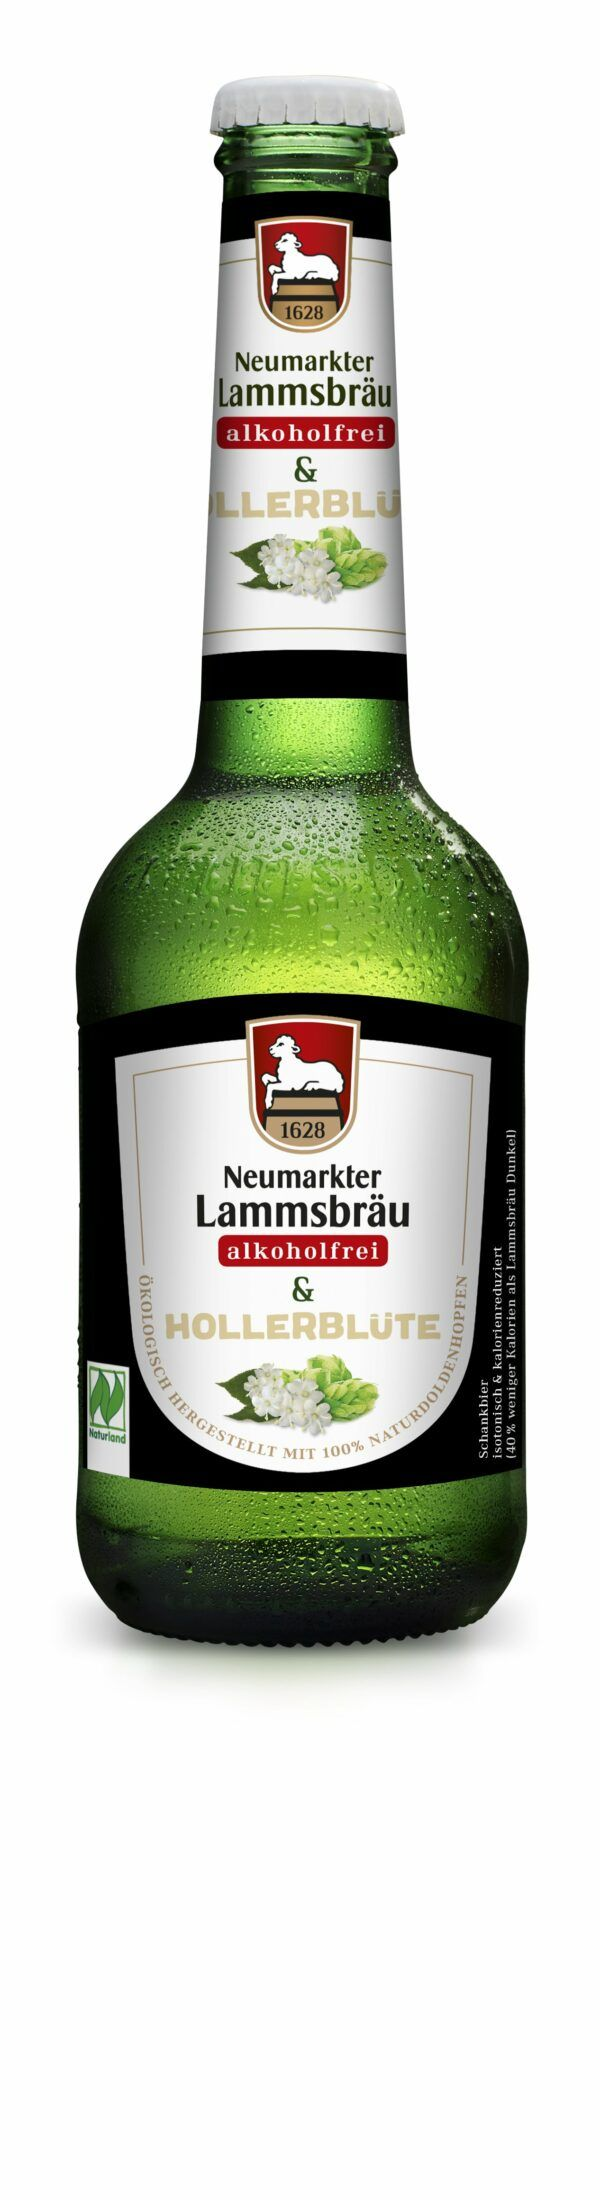 Neumarkter Lammsbräu Lammsbräu Alkoholfrei & Hollerblüte (Bio) 0,33l